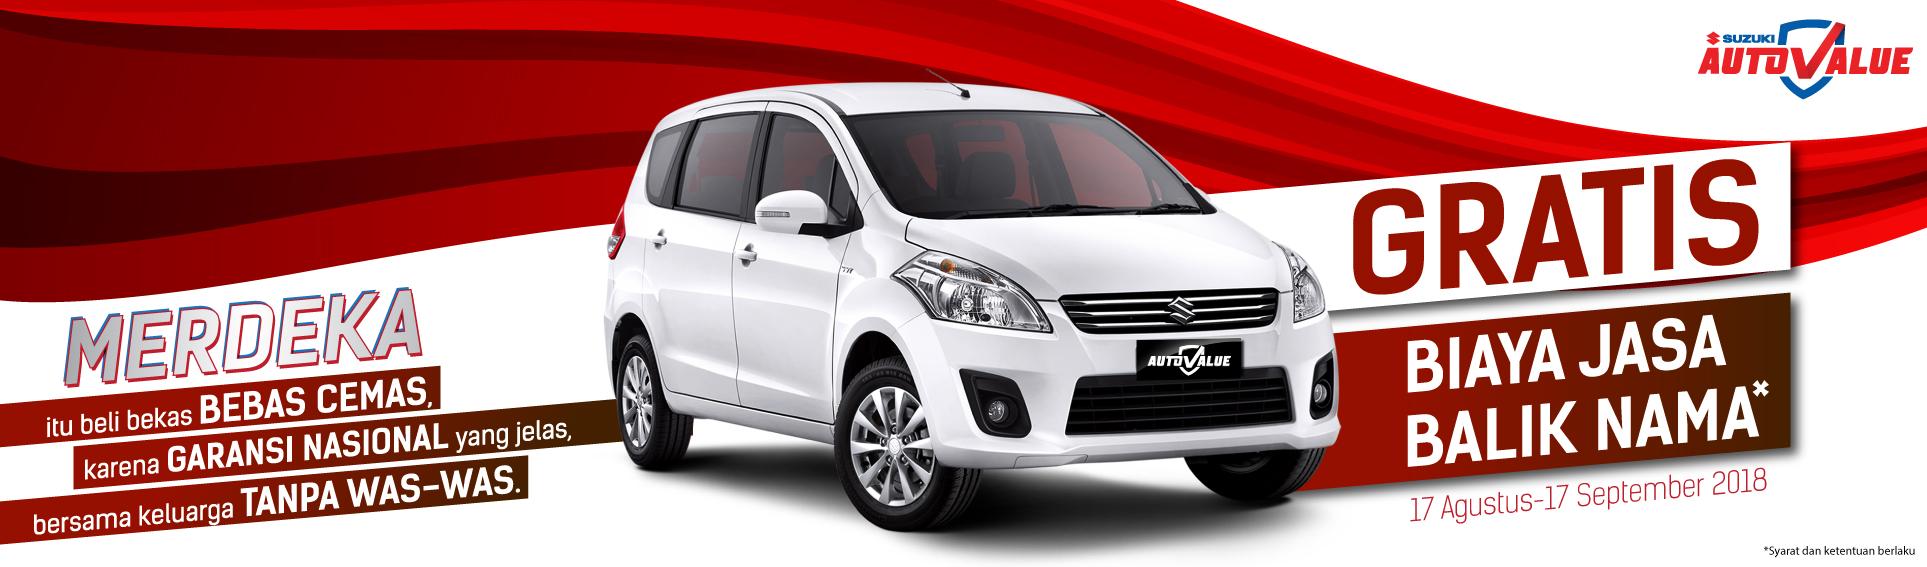 Beli Mobil Bekas Suzuki Gratis Biaya Jasa Balik Nama ...